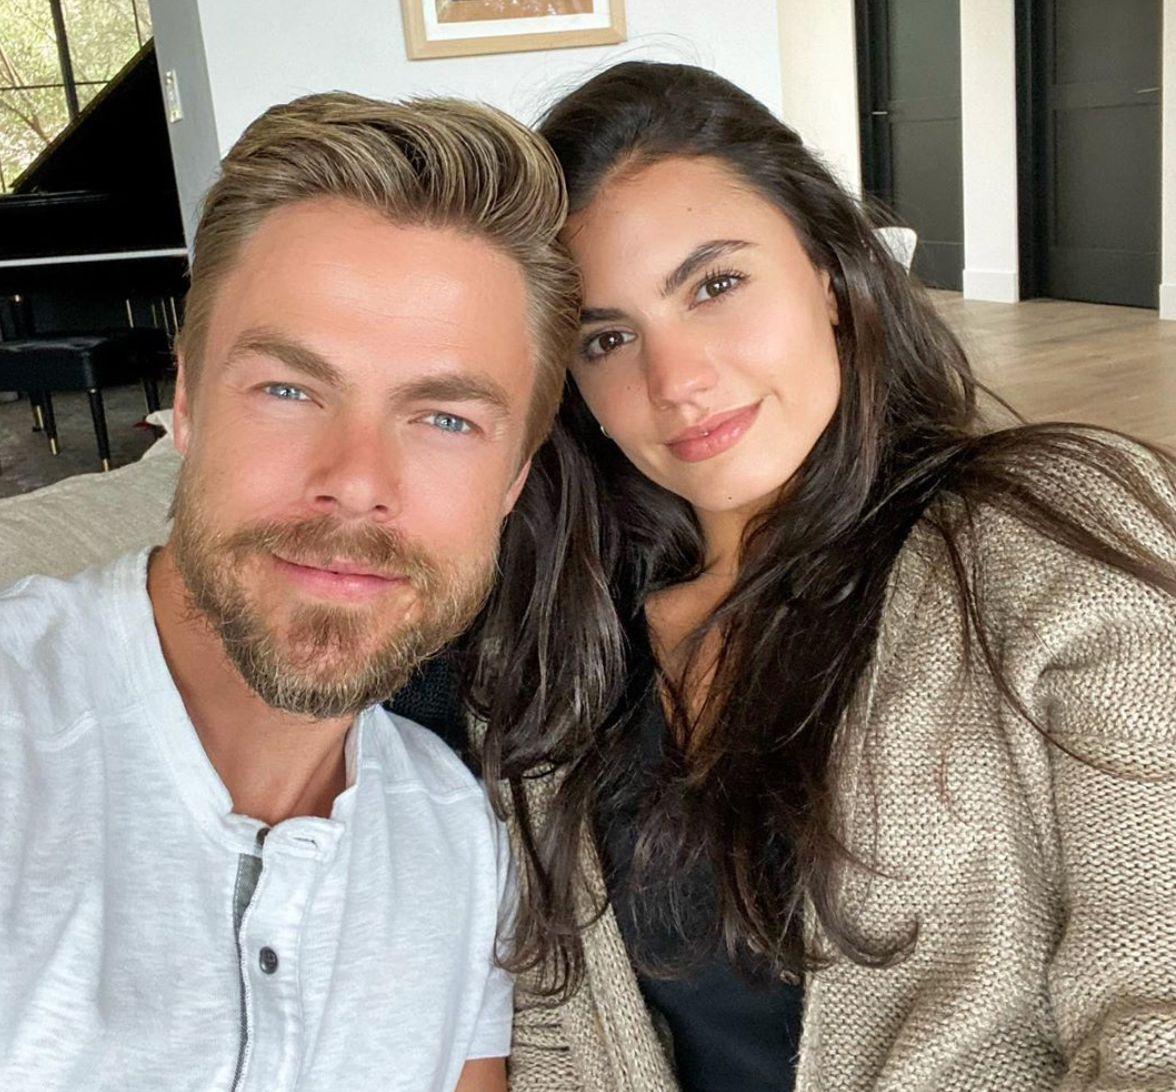 Derek Hough taking a selfie with girlfriend, Hayley Erbert.